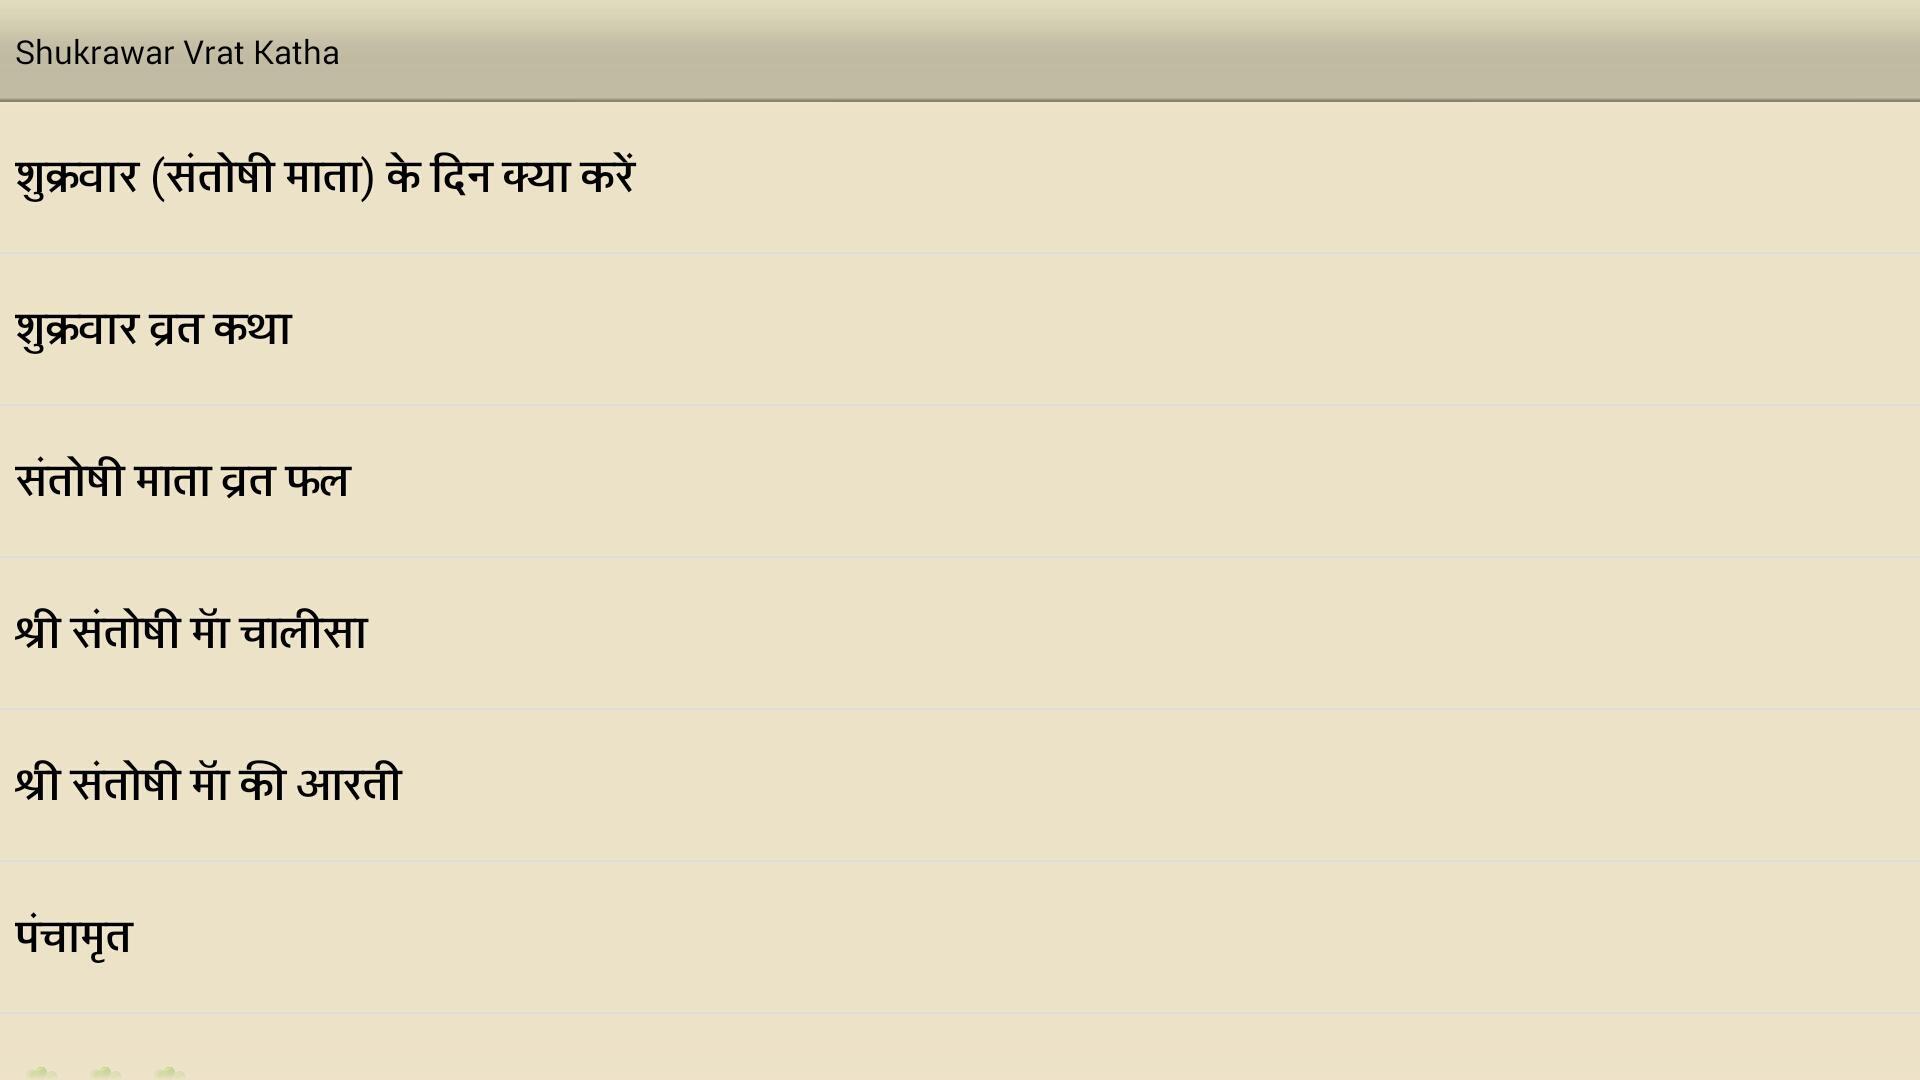 Shukrawar Vrat Katha for Android - APK Download